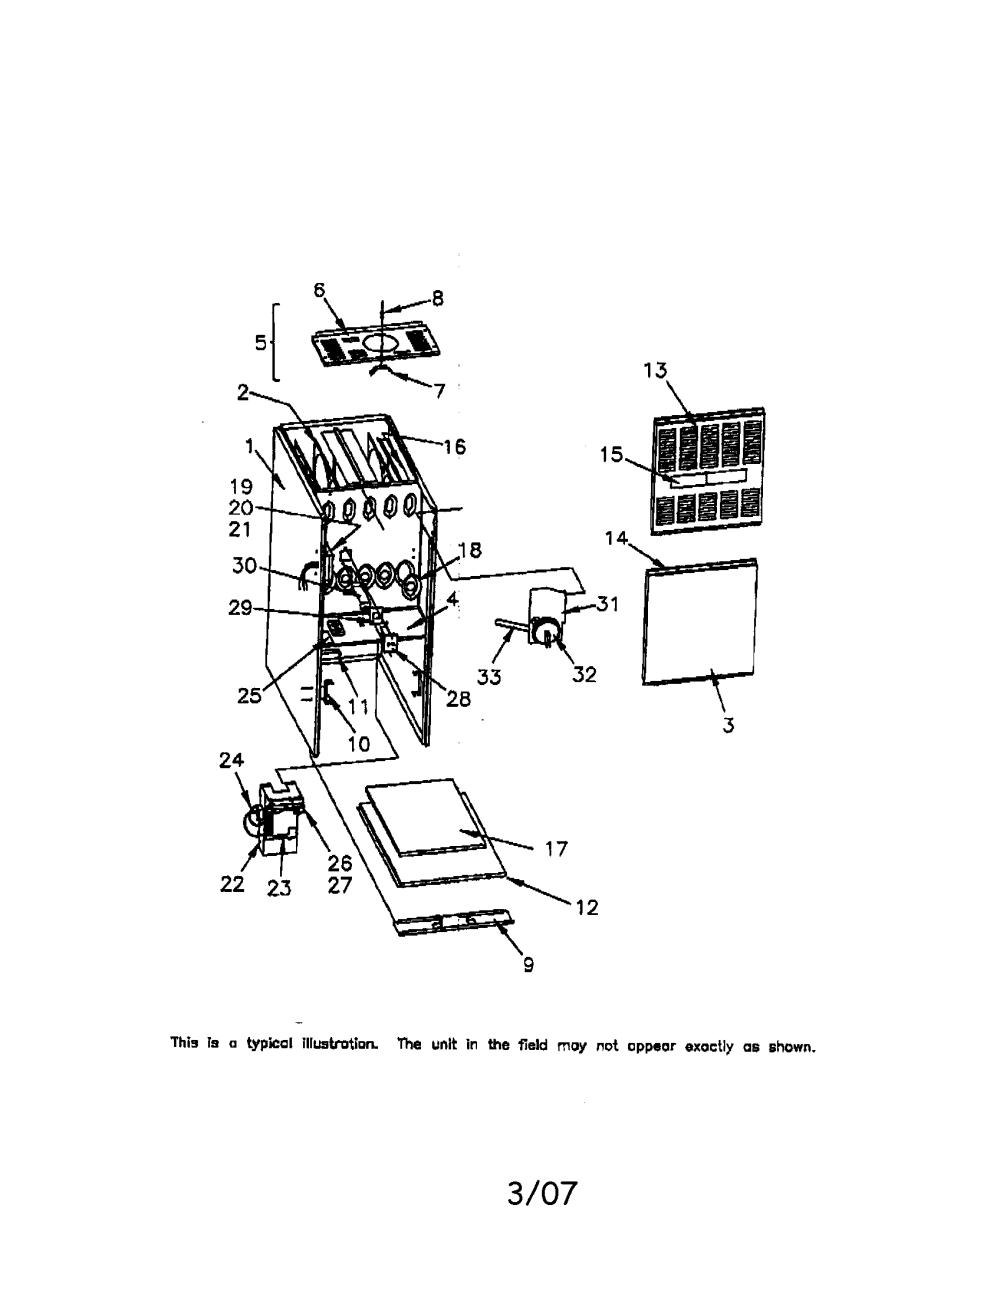 medium resolution of trane furnace schematics wiring diagram home trane furnace parts manual trane furnace diagram blog wiring diagram